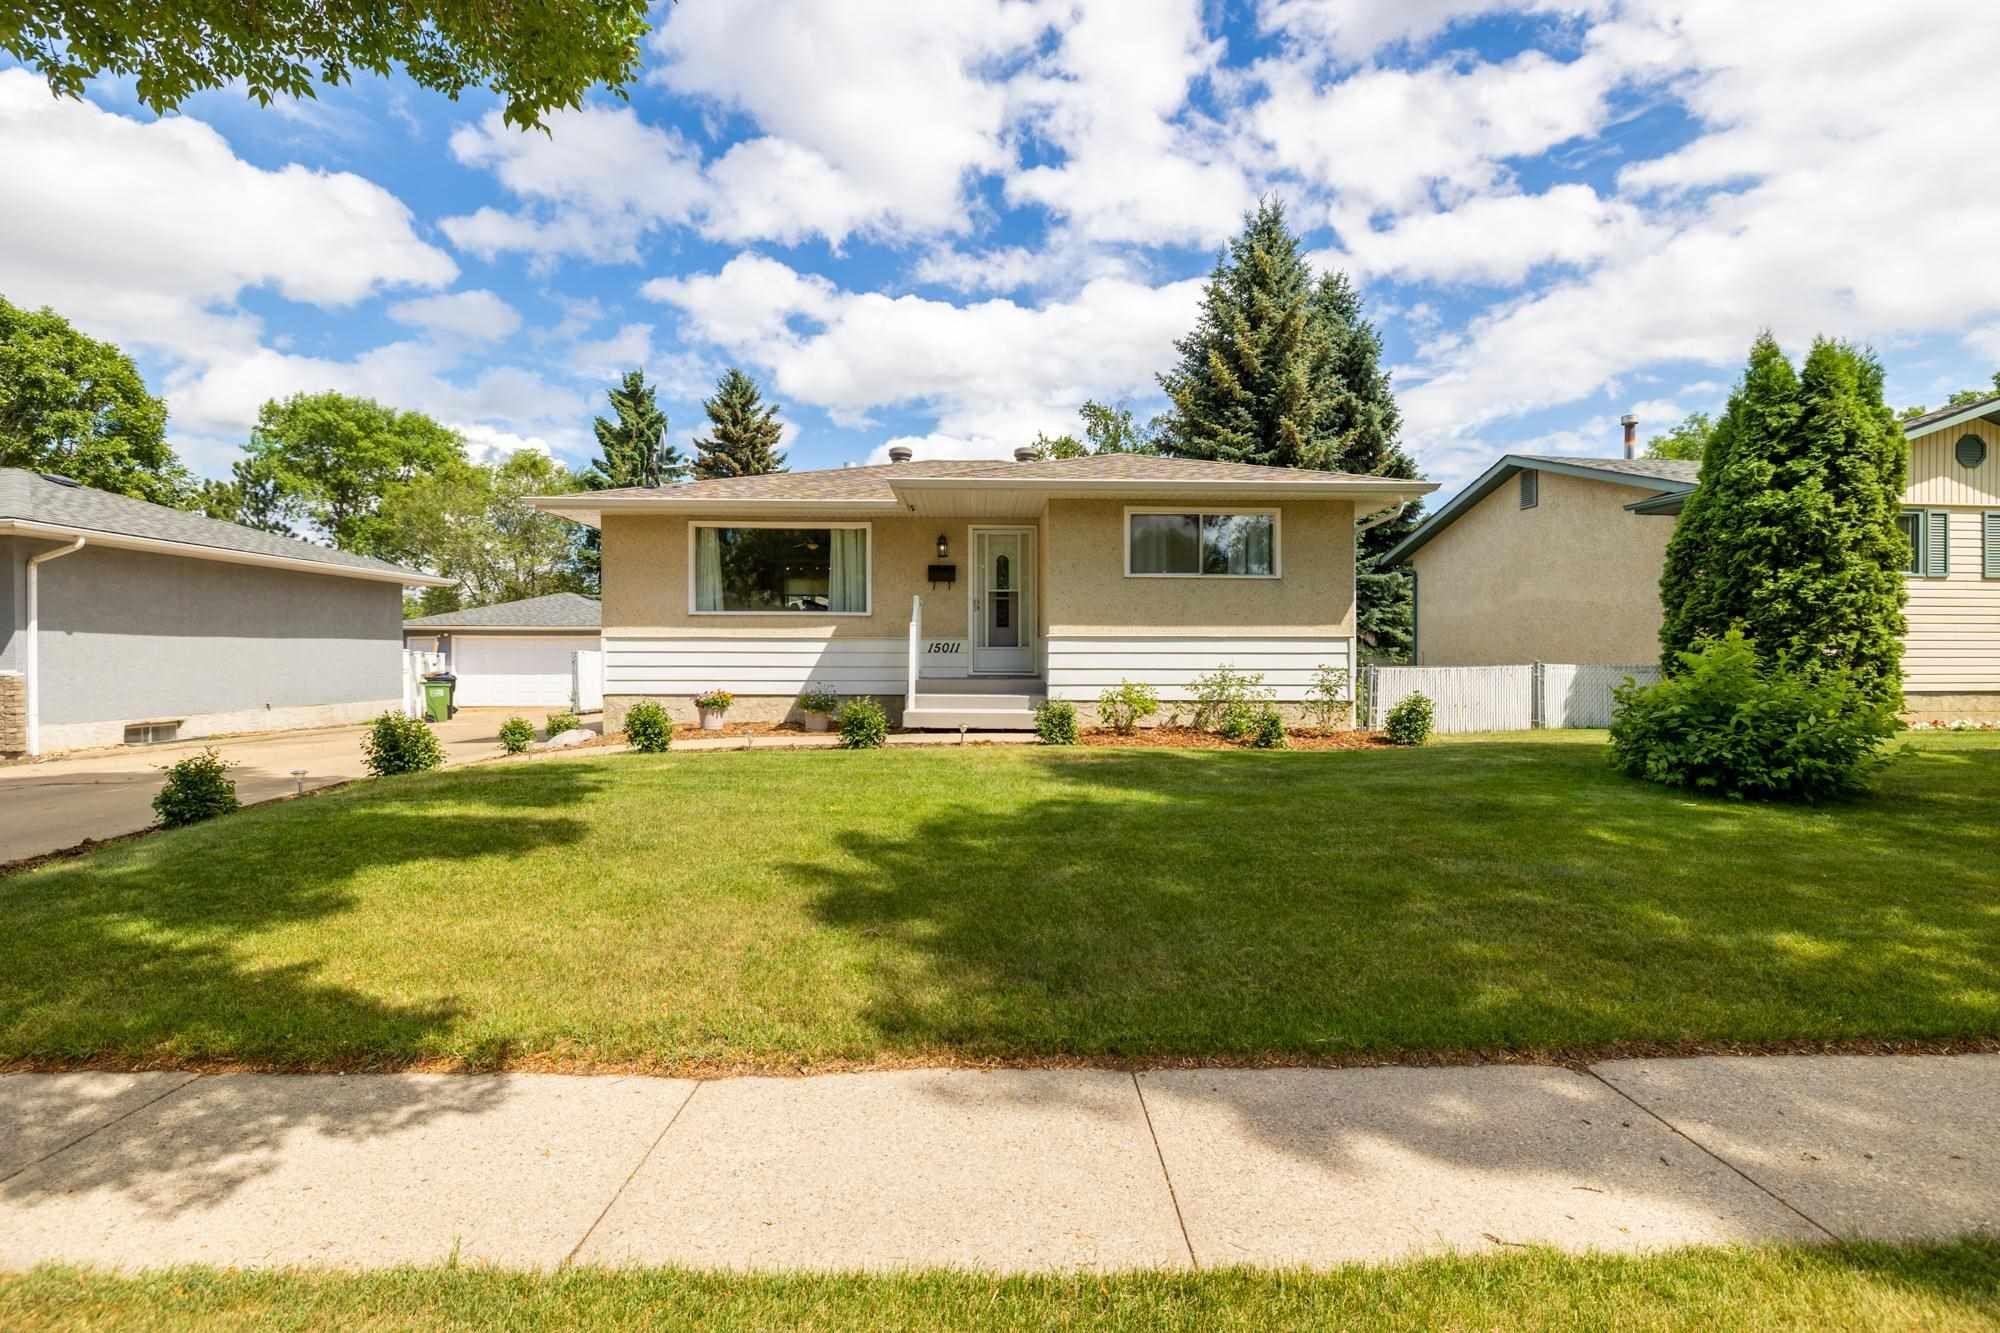 Main Photo: 15011 64 Street in Edmonton: Zone 02 House for sale : MLS®# E4253519